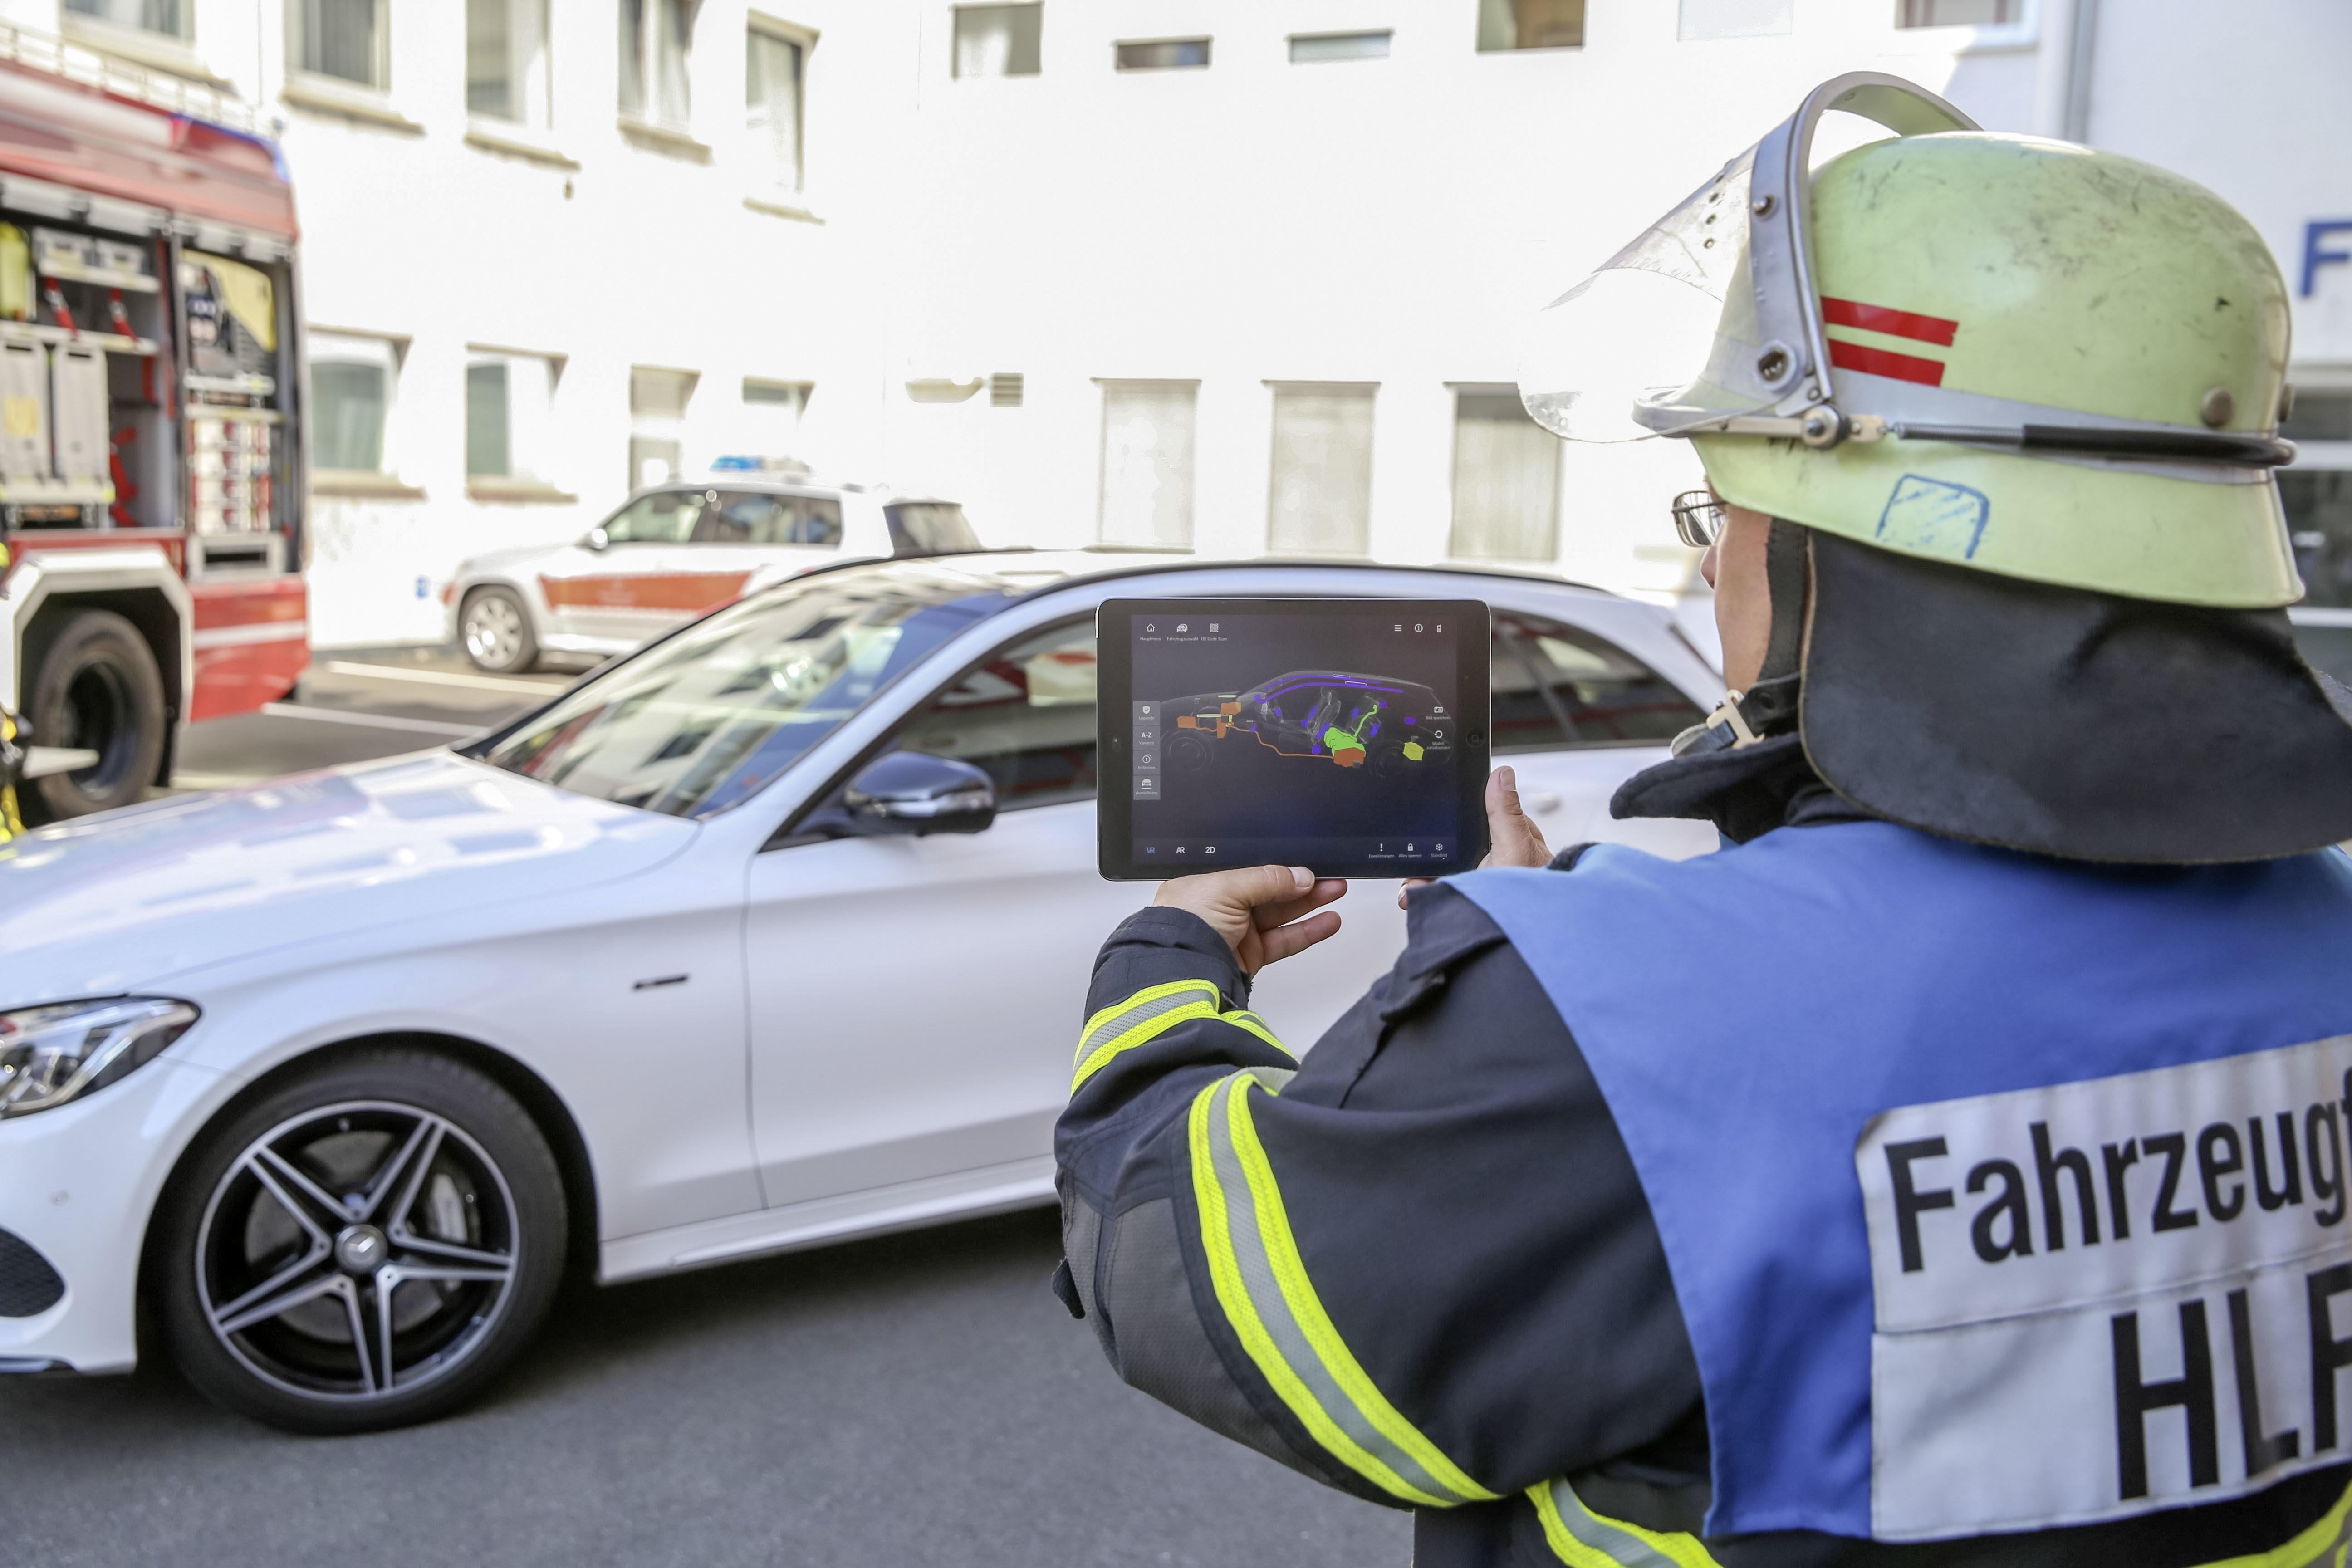 Mercedes-Benz 的救援輔助 App 增加了 AR 功能 。圖片來源:Daimler